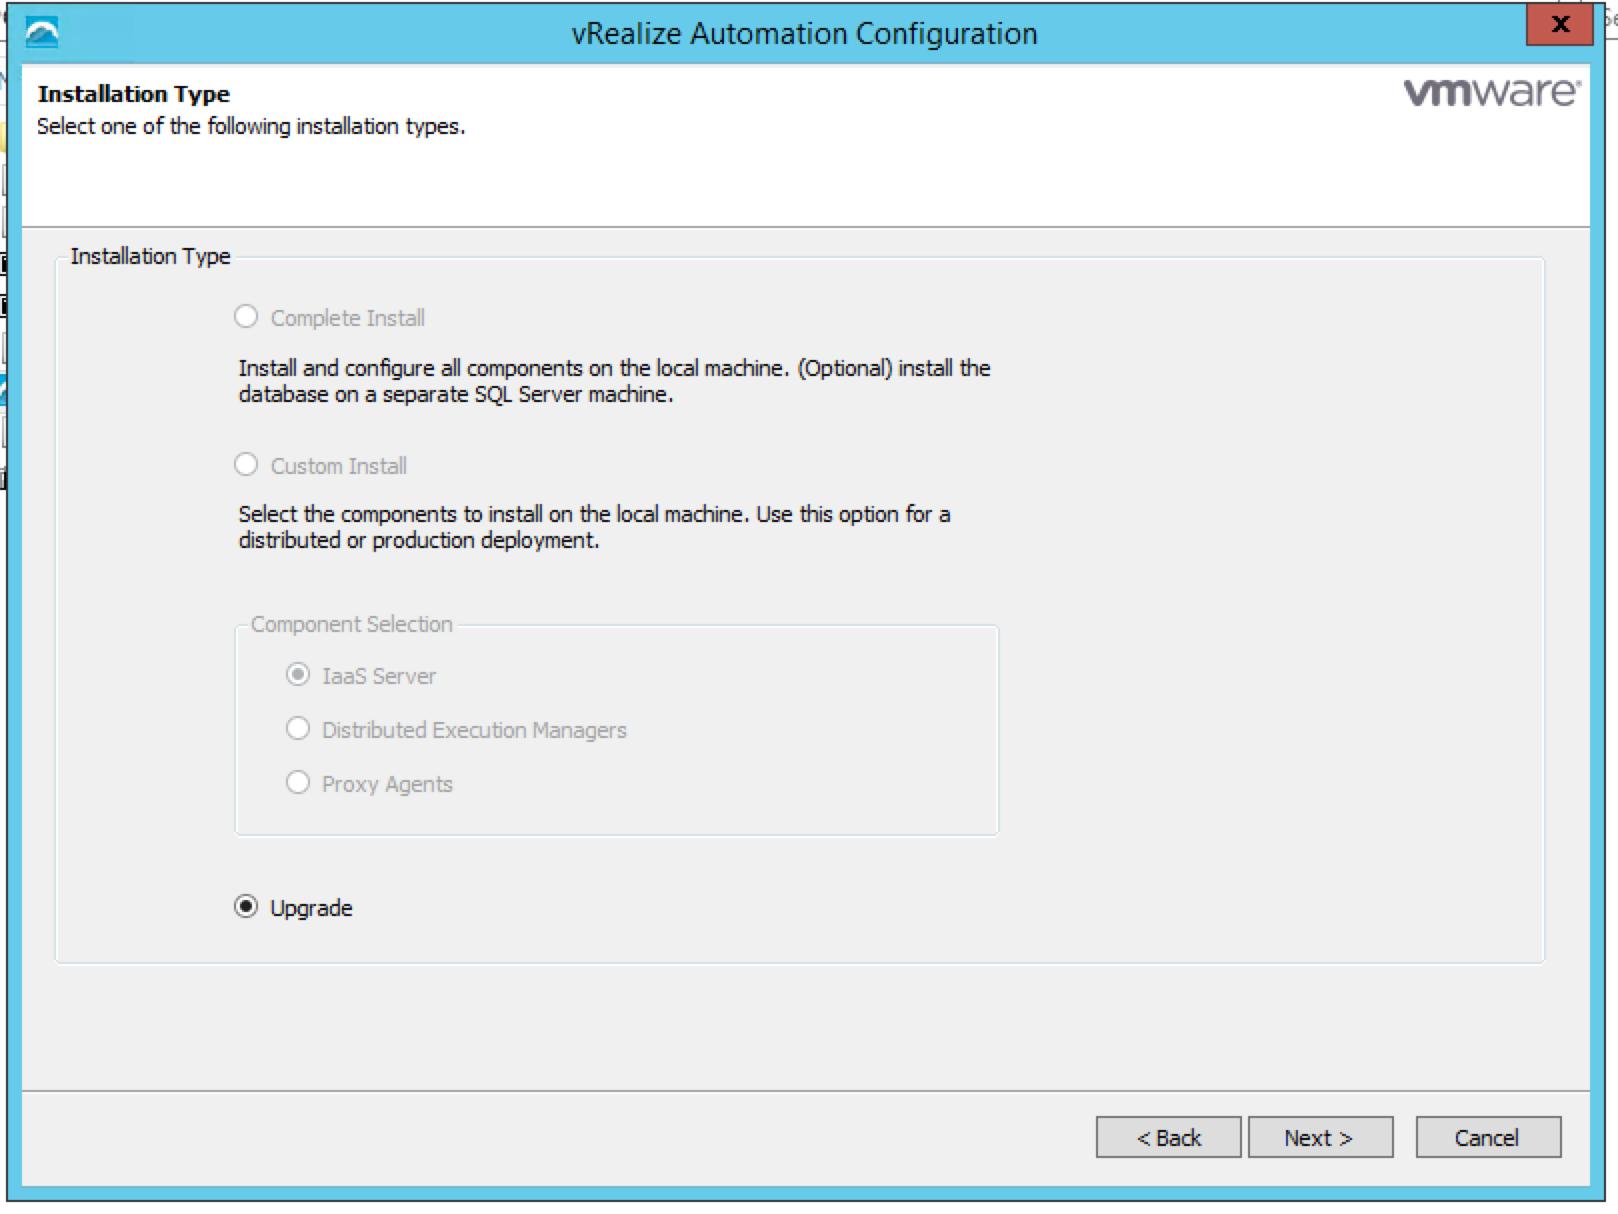 vRA 7.0.1 IaaS Installation – 4